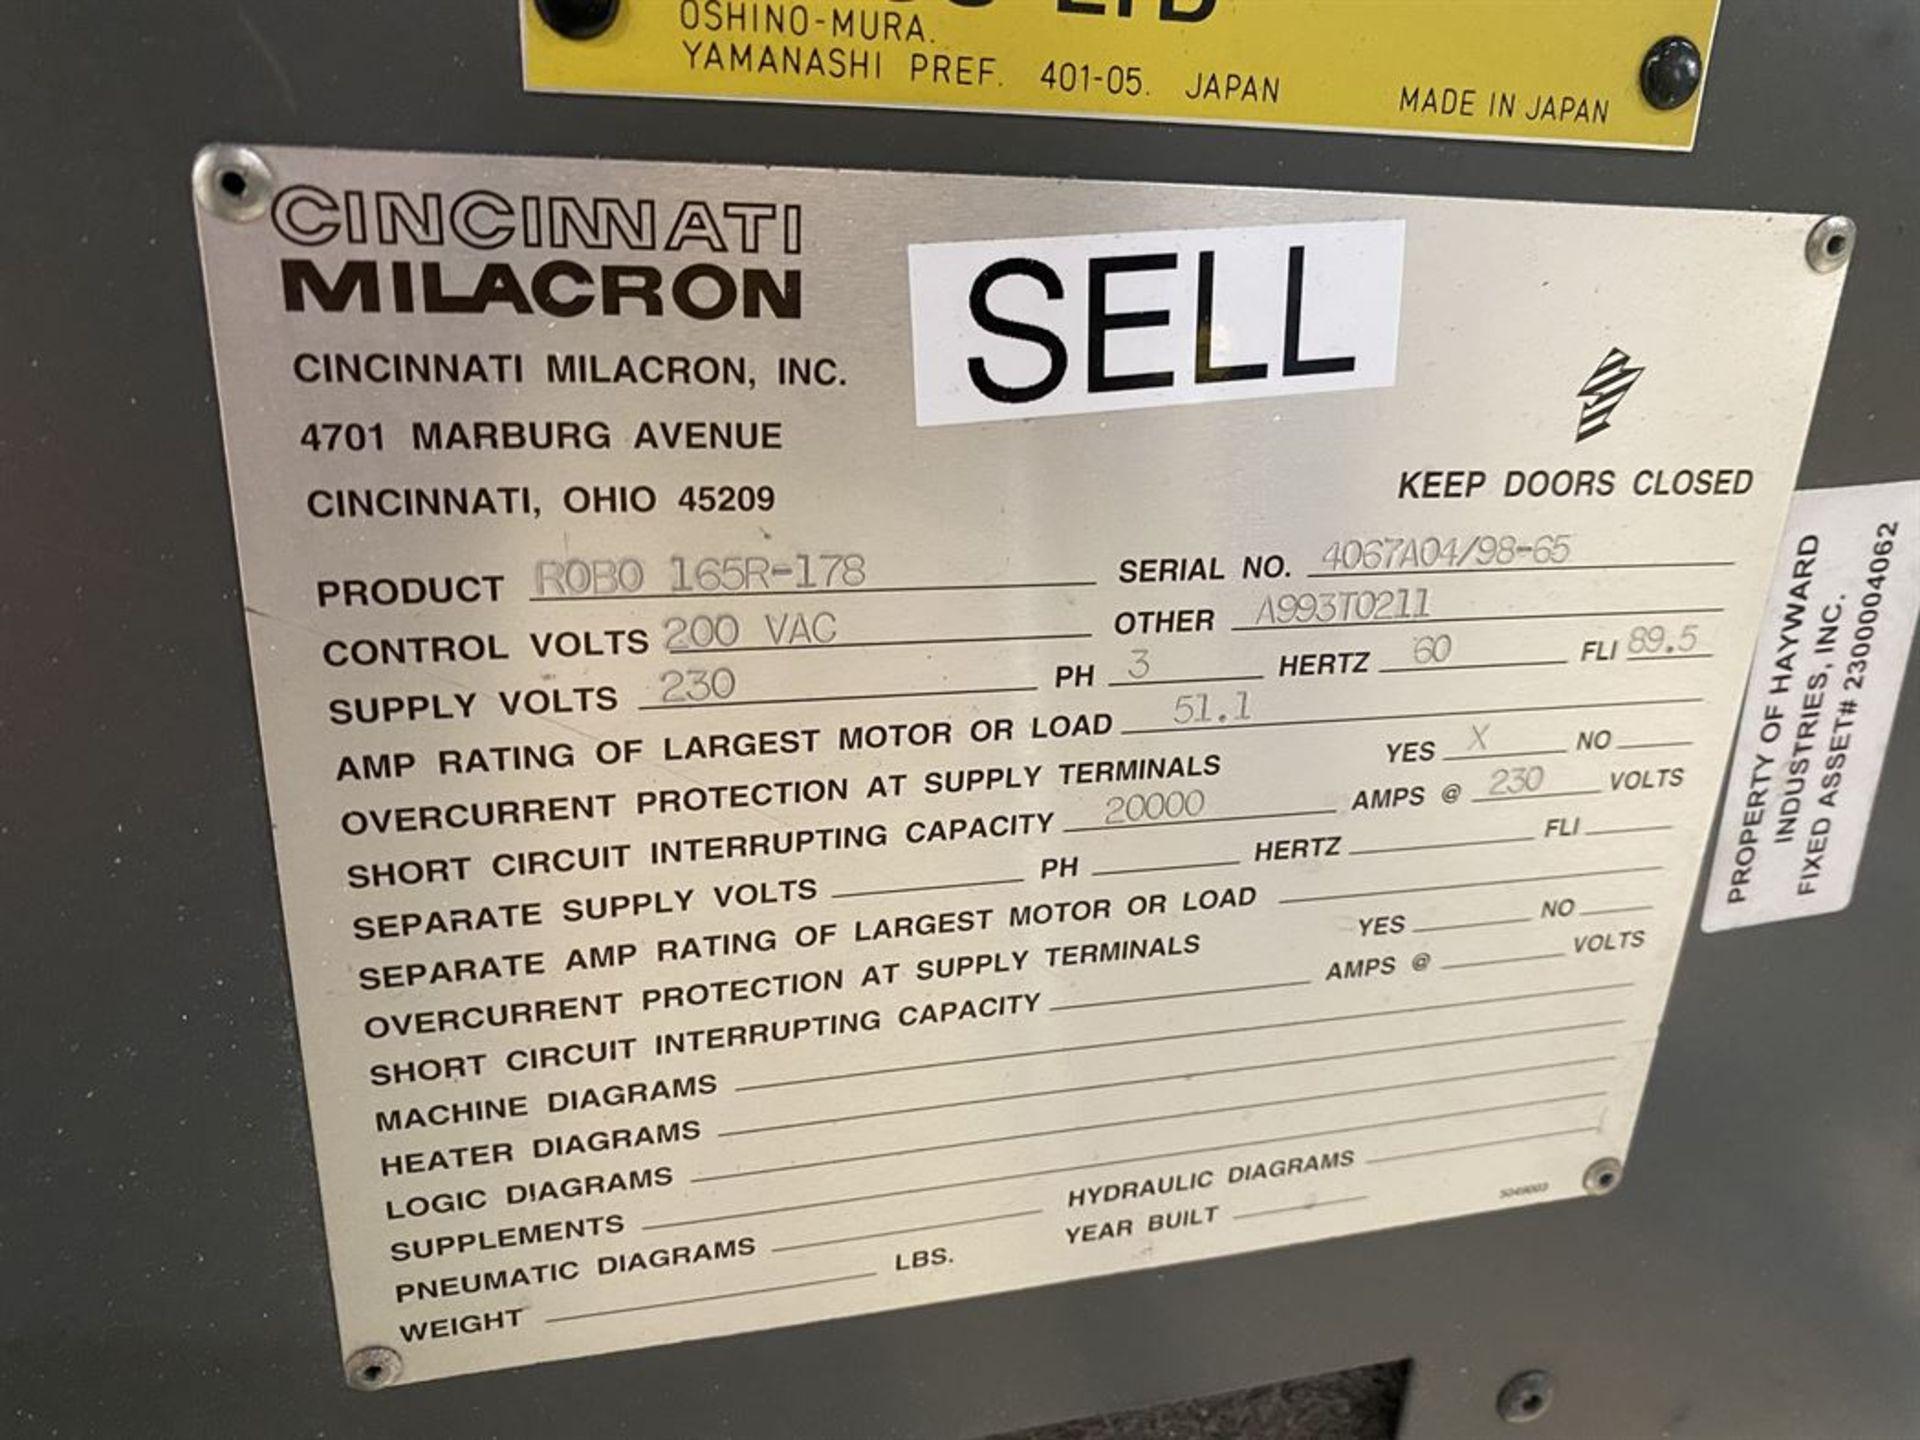 Lot 194 - CINCINNATI MILACRON FANUC RoboShot 165R-178 165 Ton Electric Injection Molders, s/n 4067A04/98-65,